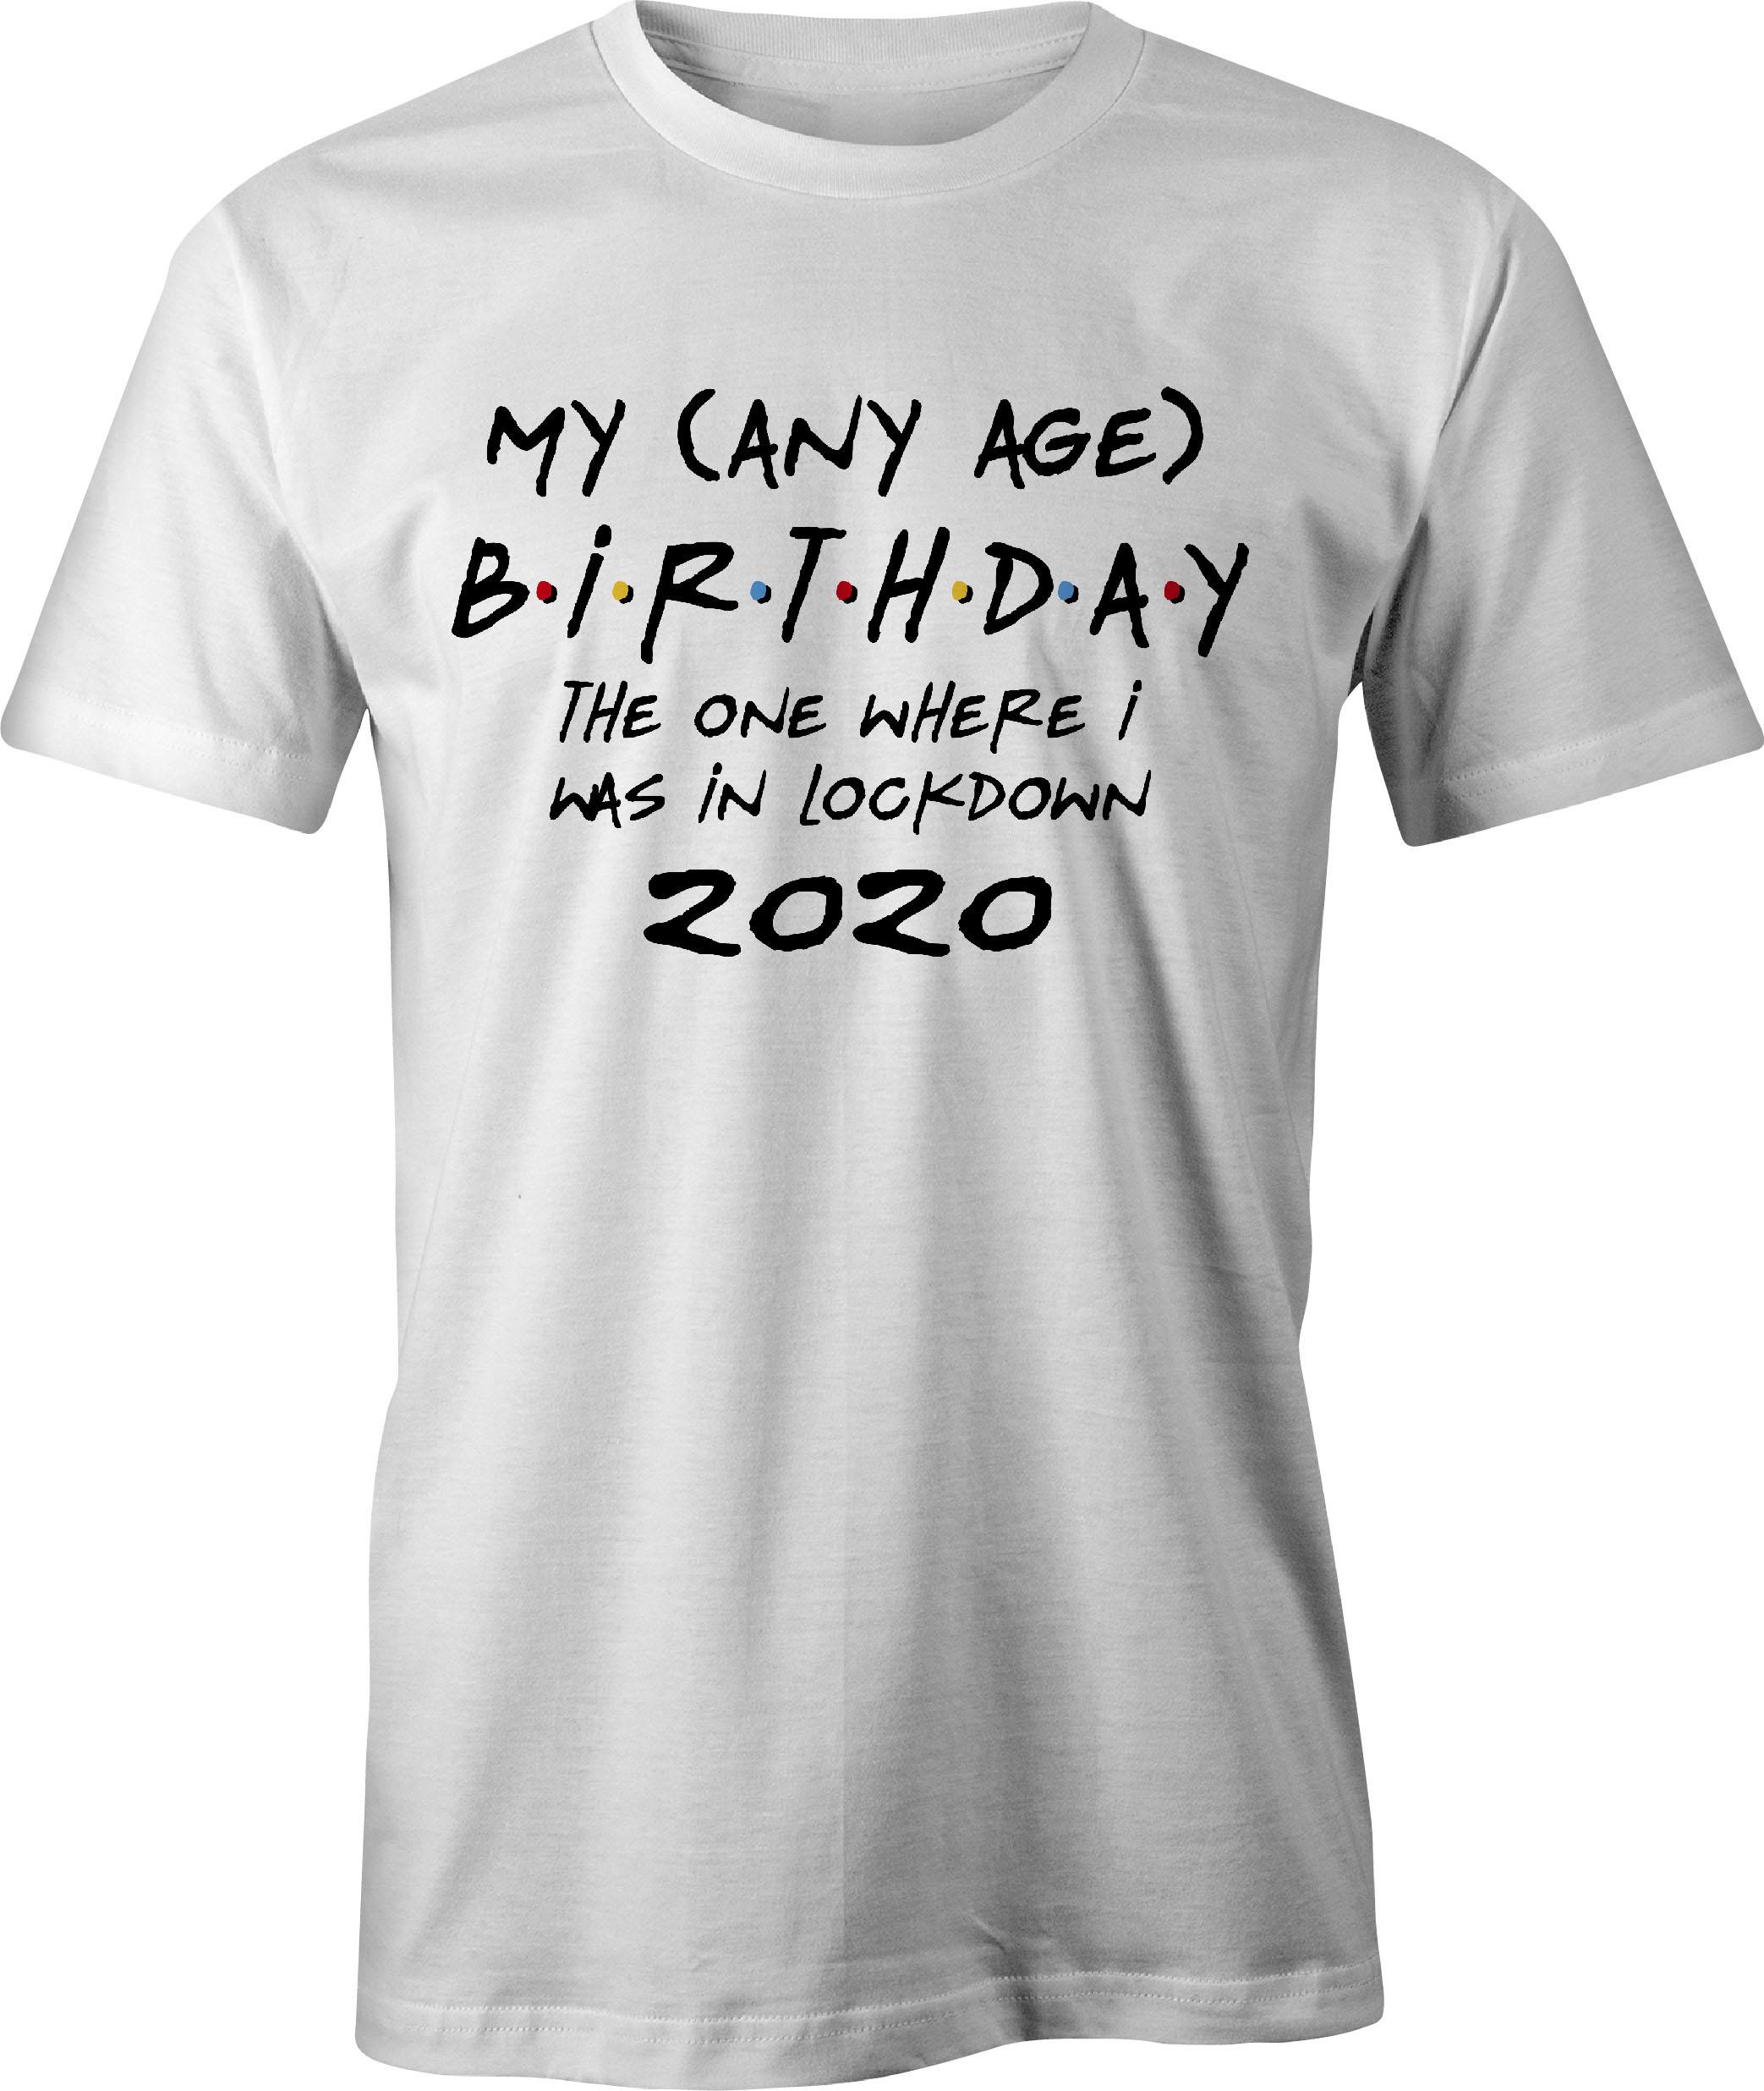 Any age birthday lockdown t-shirt - white